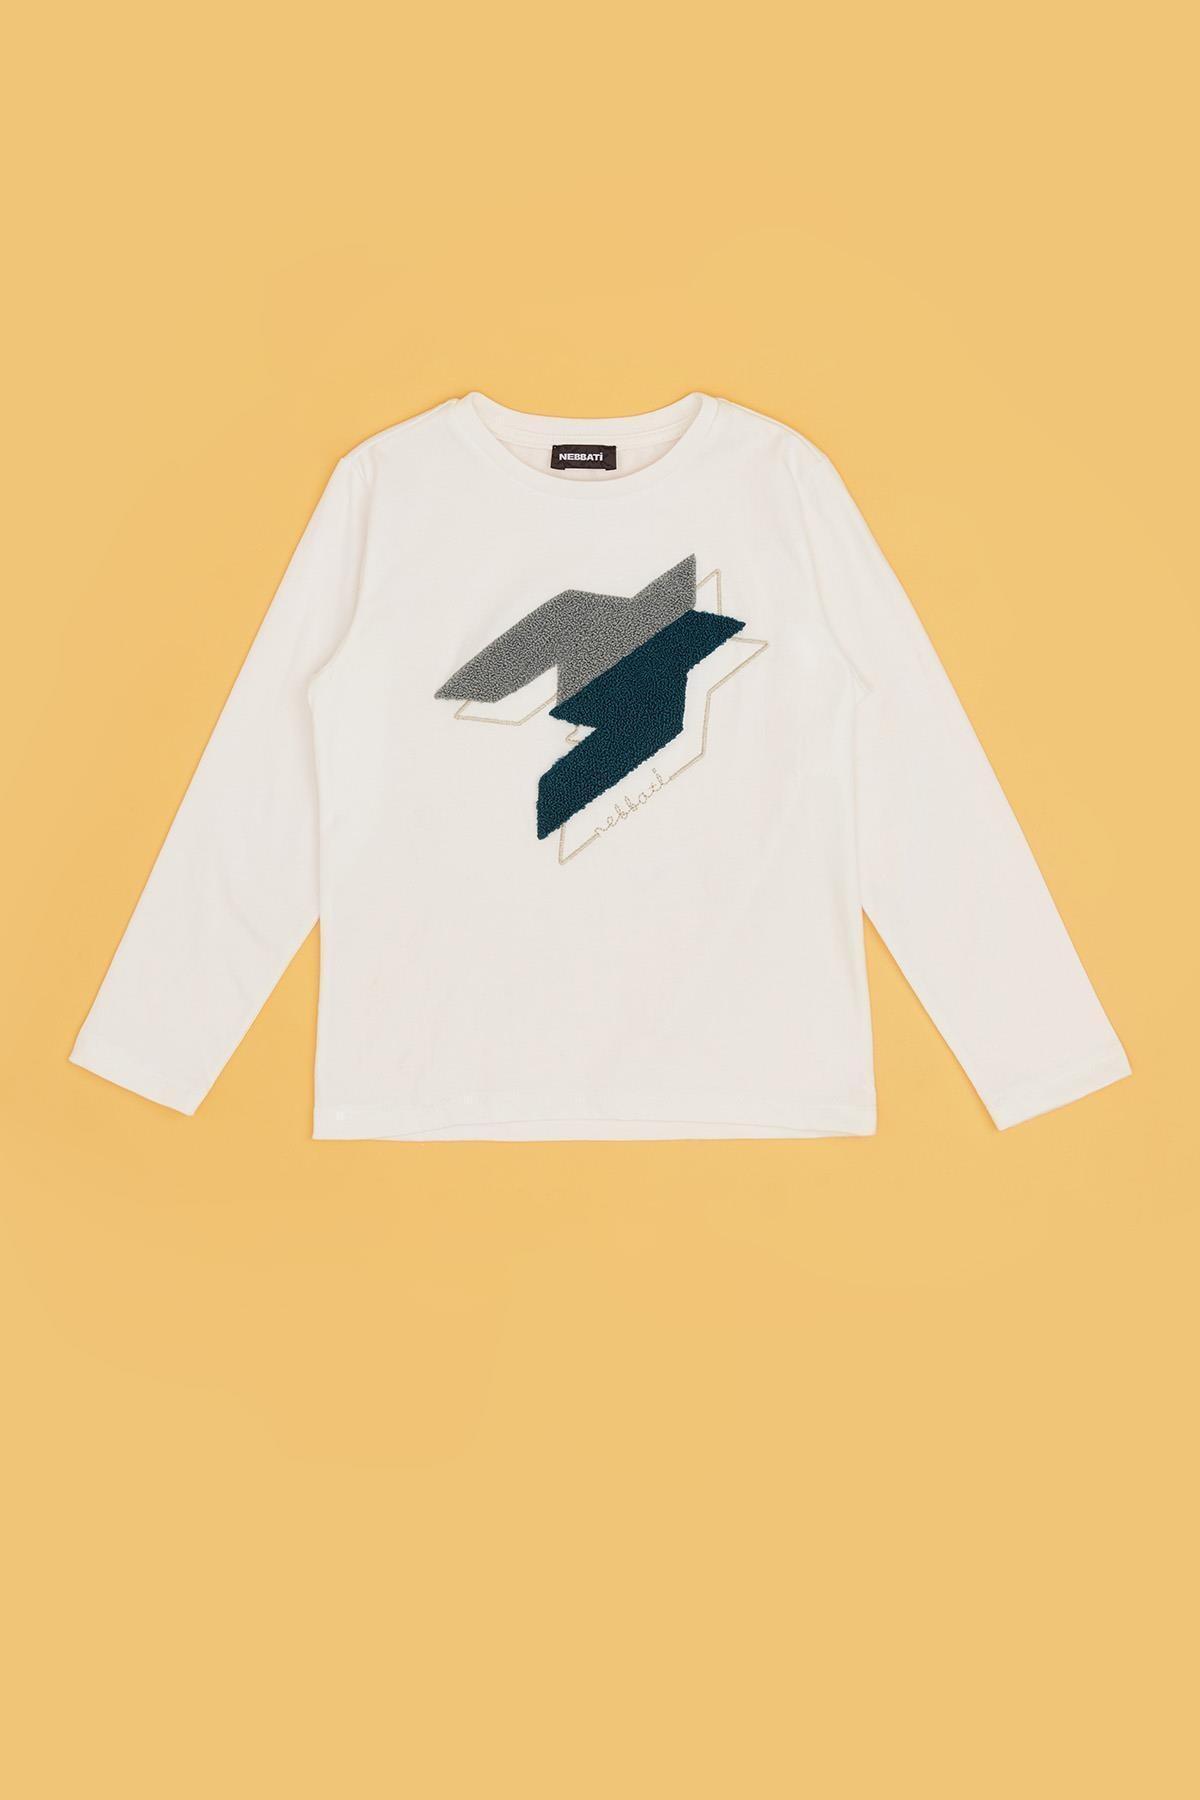 Nebbati Erkek Çocuk Beyaz T-shirt 20fw0nb3520 2